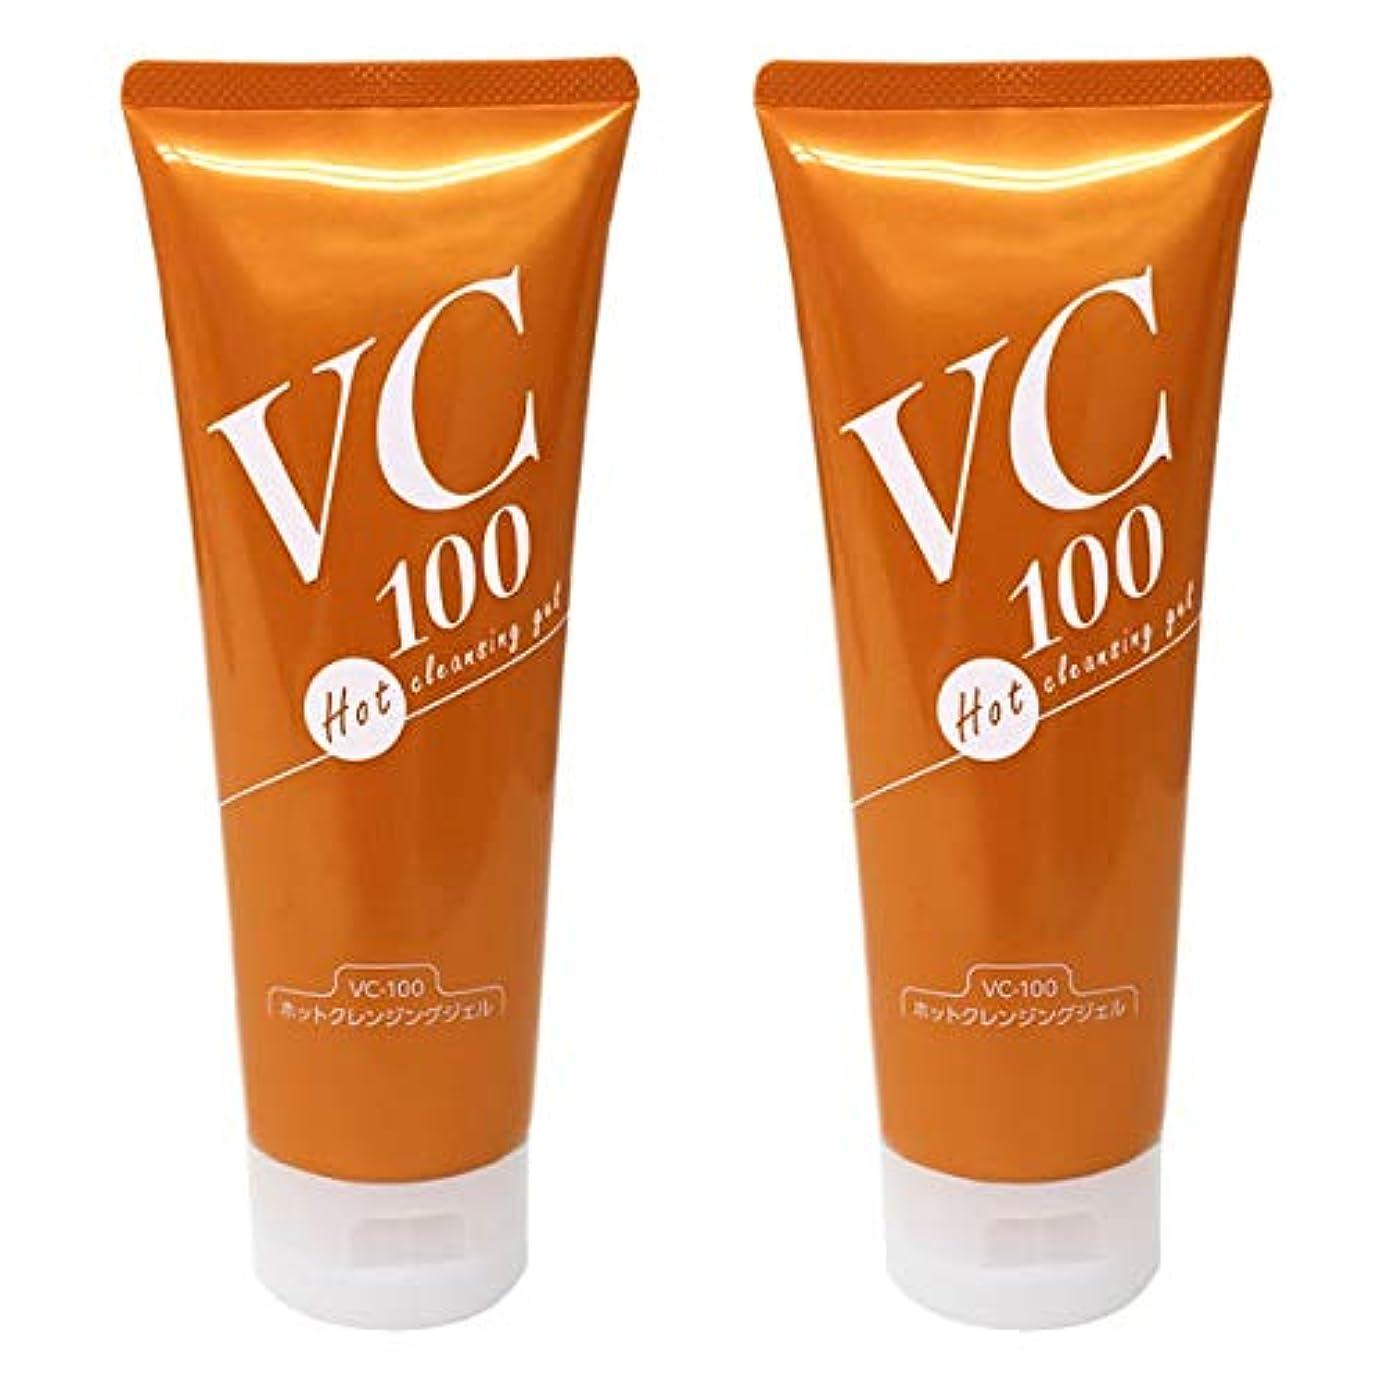 VC-100ホットクレンジングジェル200g 高浸透型ビタミンC誘導体配合温感クレンジングジェル (2本セット)